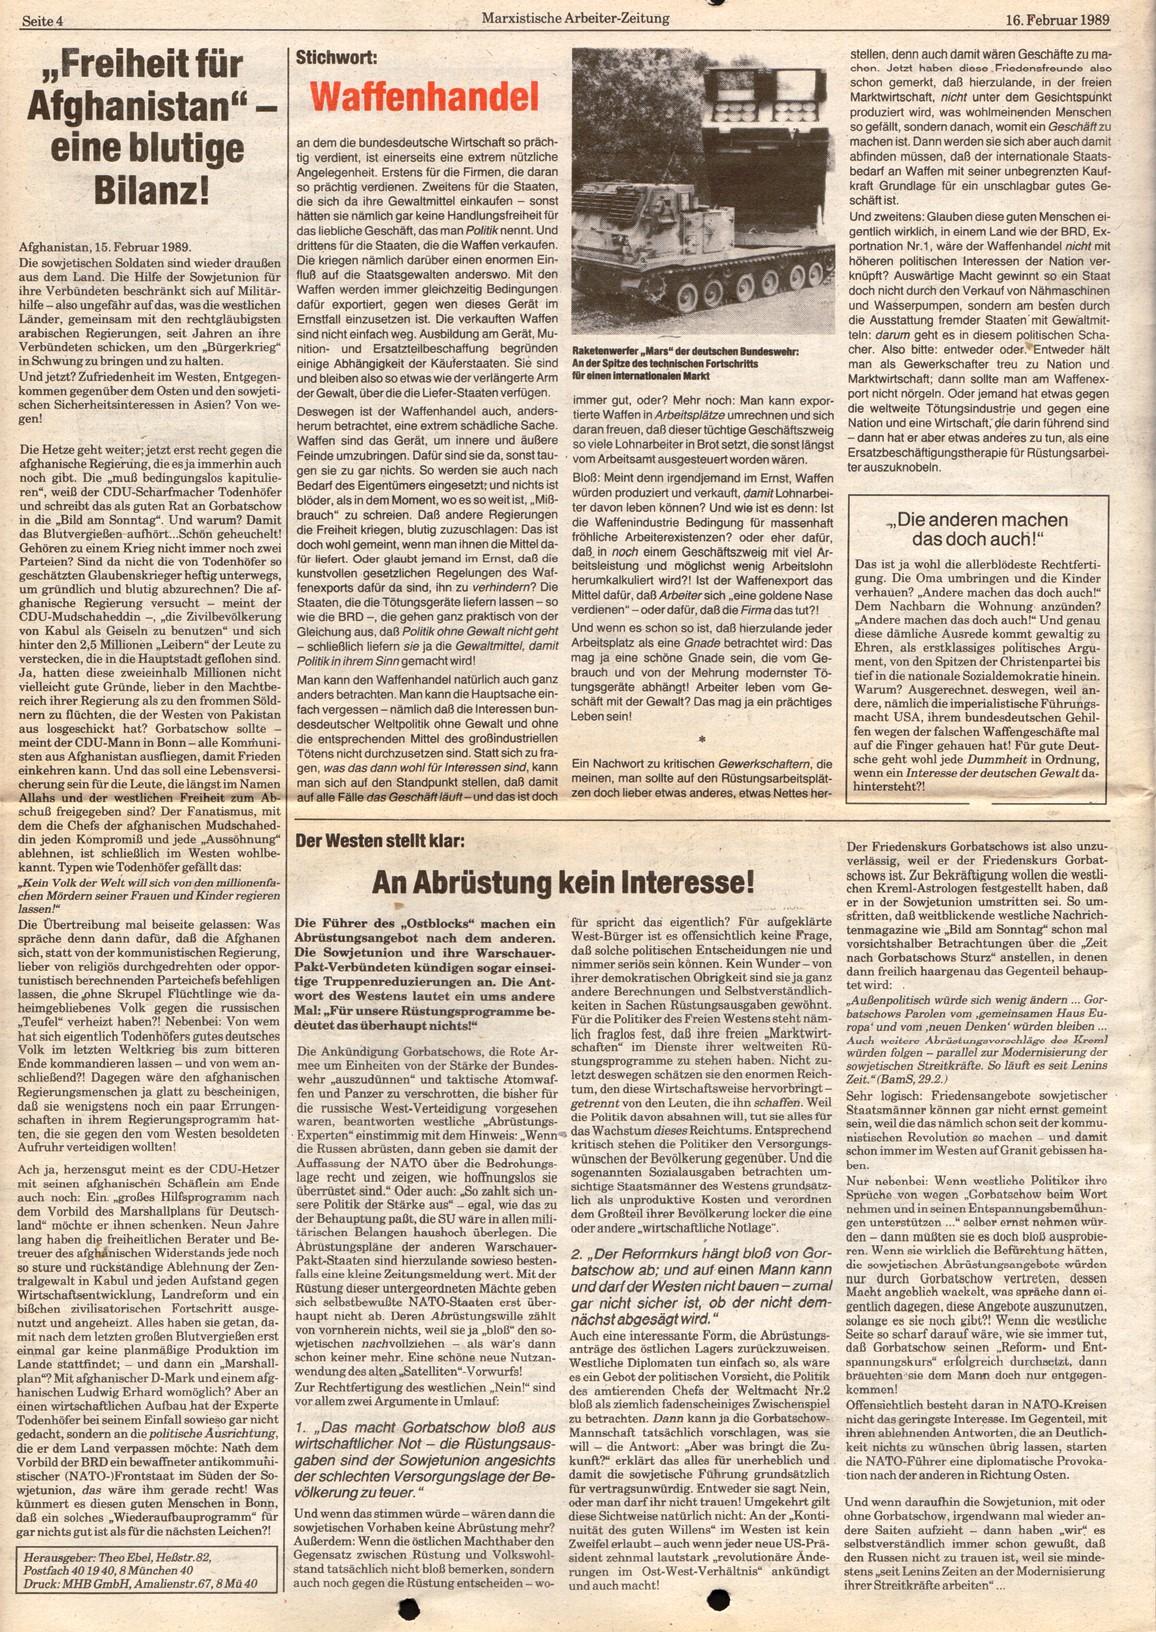 Muenchen_MG_MAZ_19890216_04